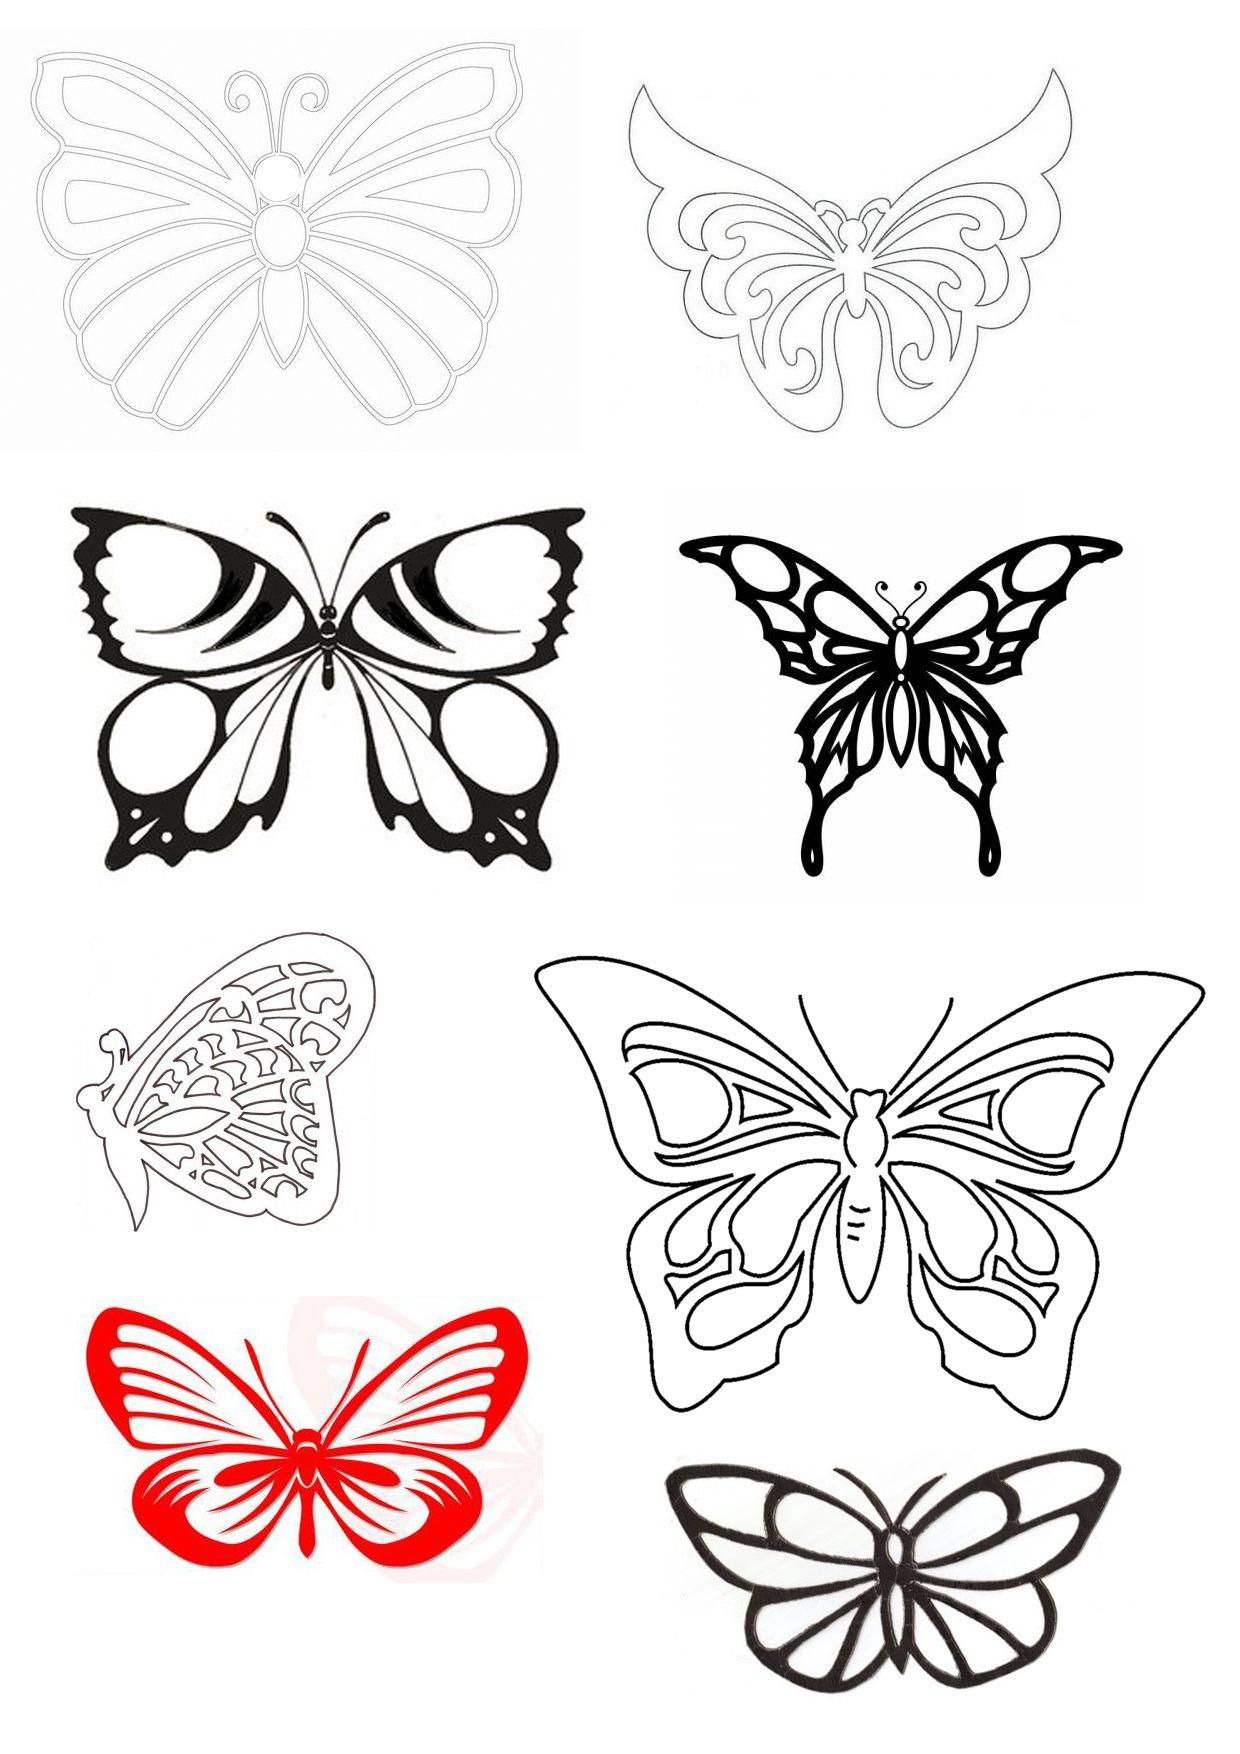 Шаблон бабочки открытка, любим открытки